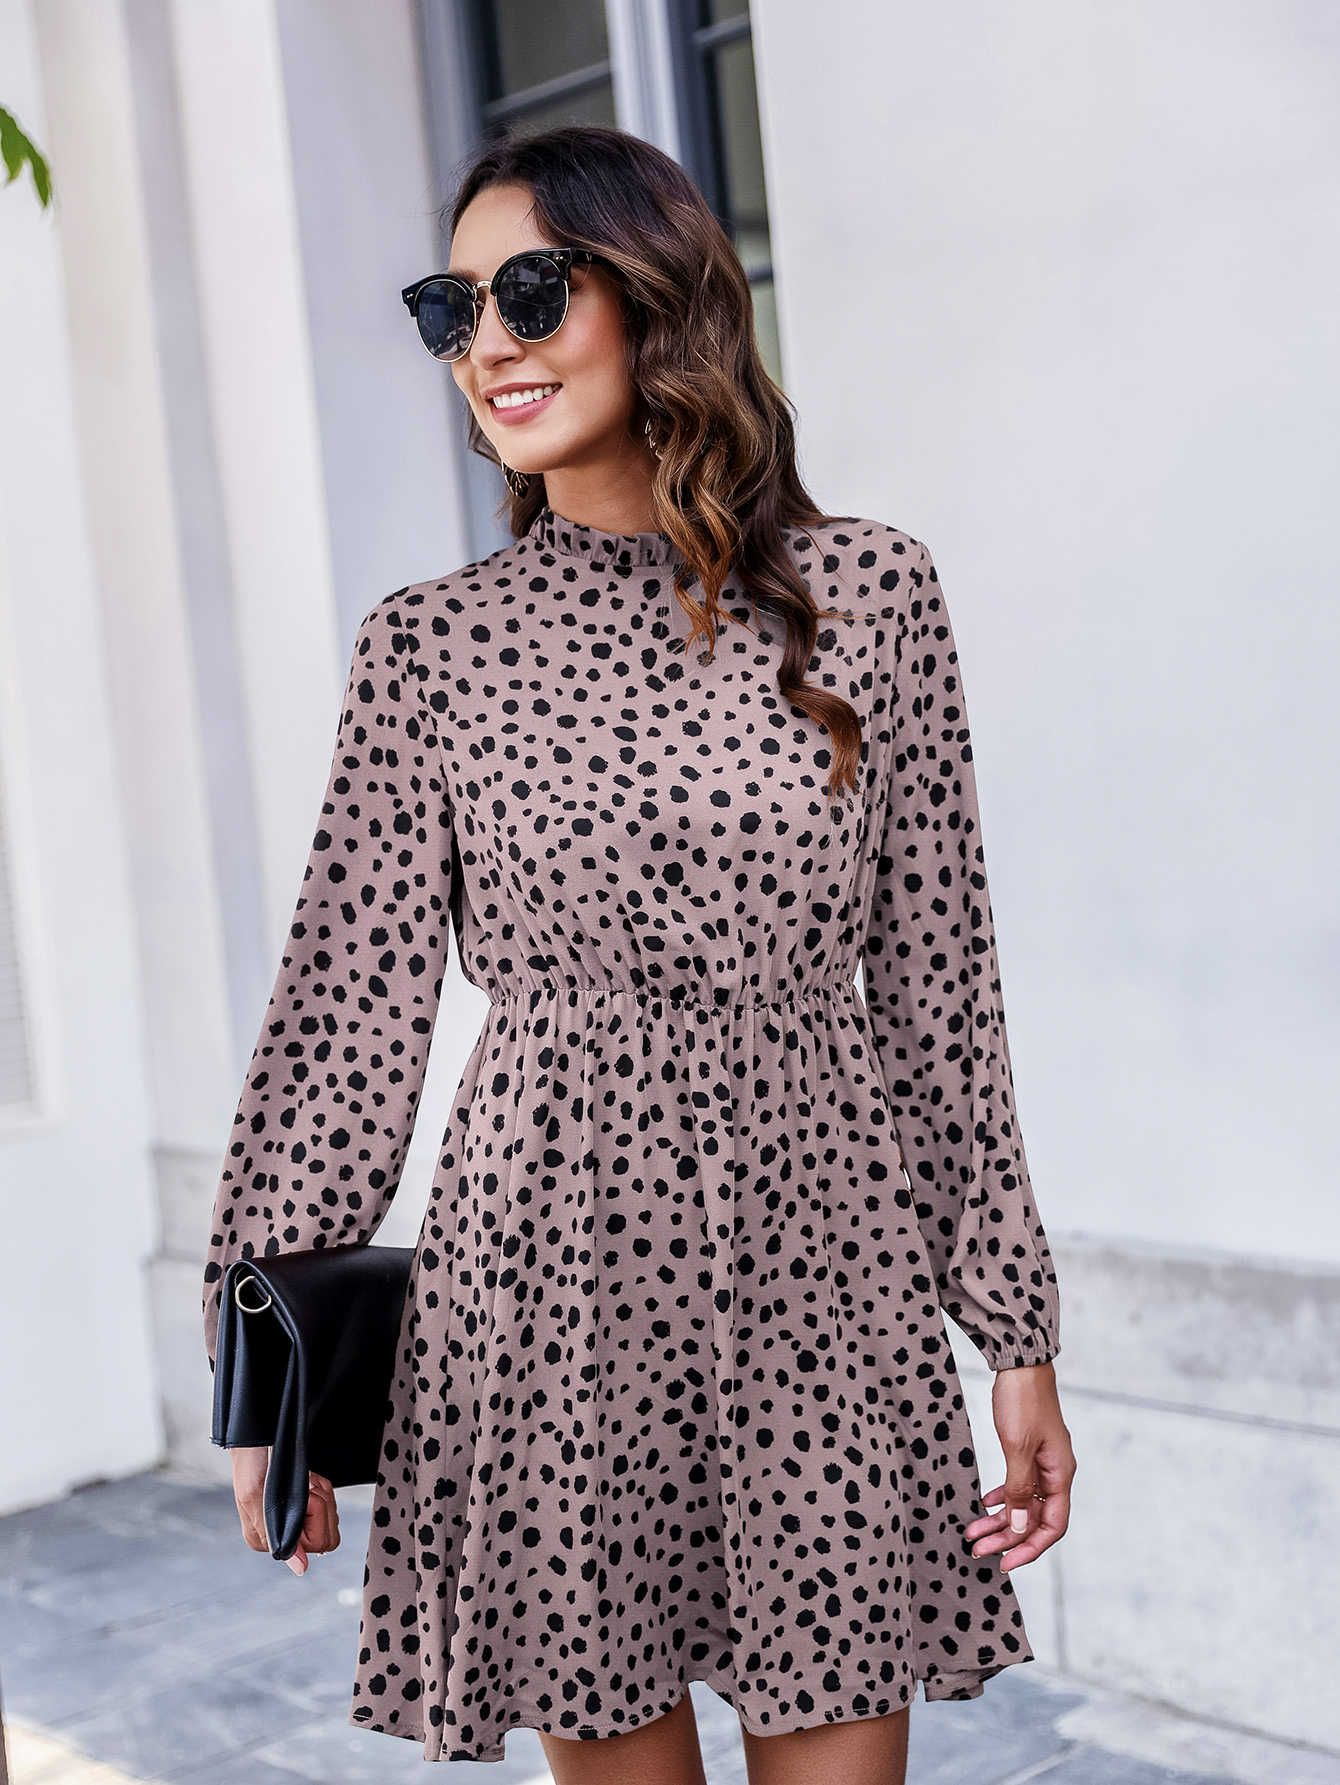 Black Friday 2020 Keyhole Back Frill Neck Dalmatian Dress Shein Usa In 2020 Fashion Clothes Women Dresses Fashion Outfits